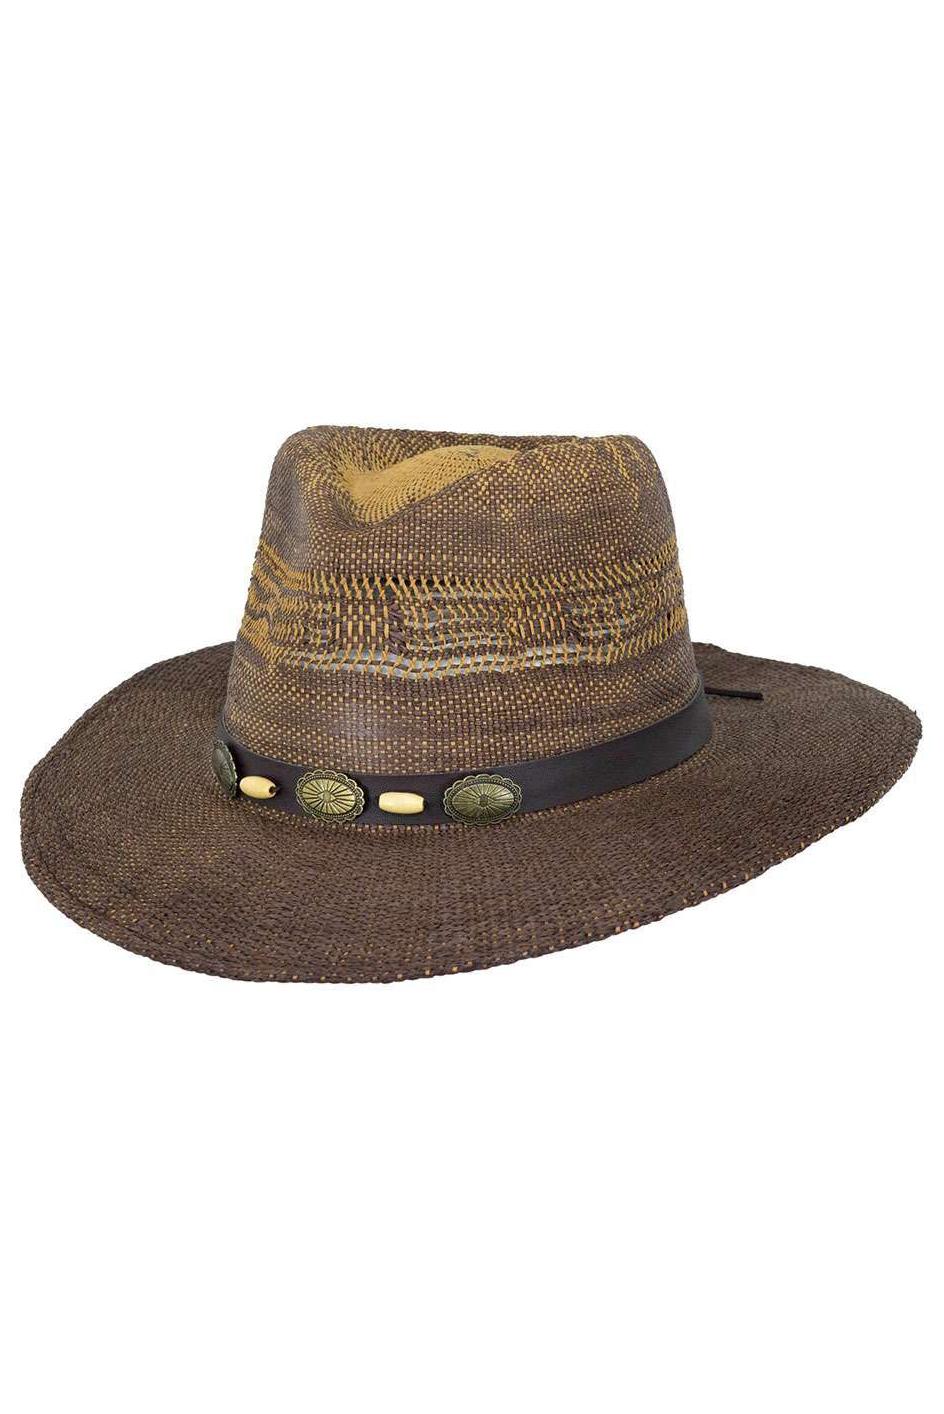 Velvet Flowers Along The Shade Cloth Outdoor Sun Hat Casual Wild Sun Hat